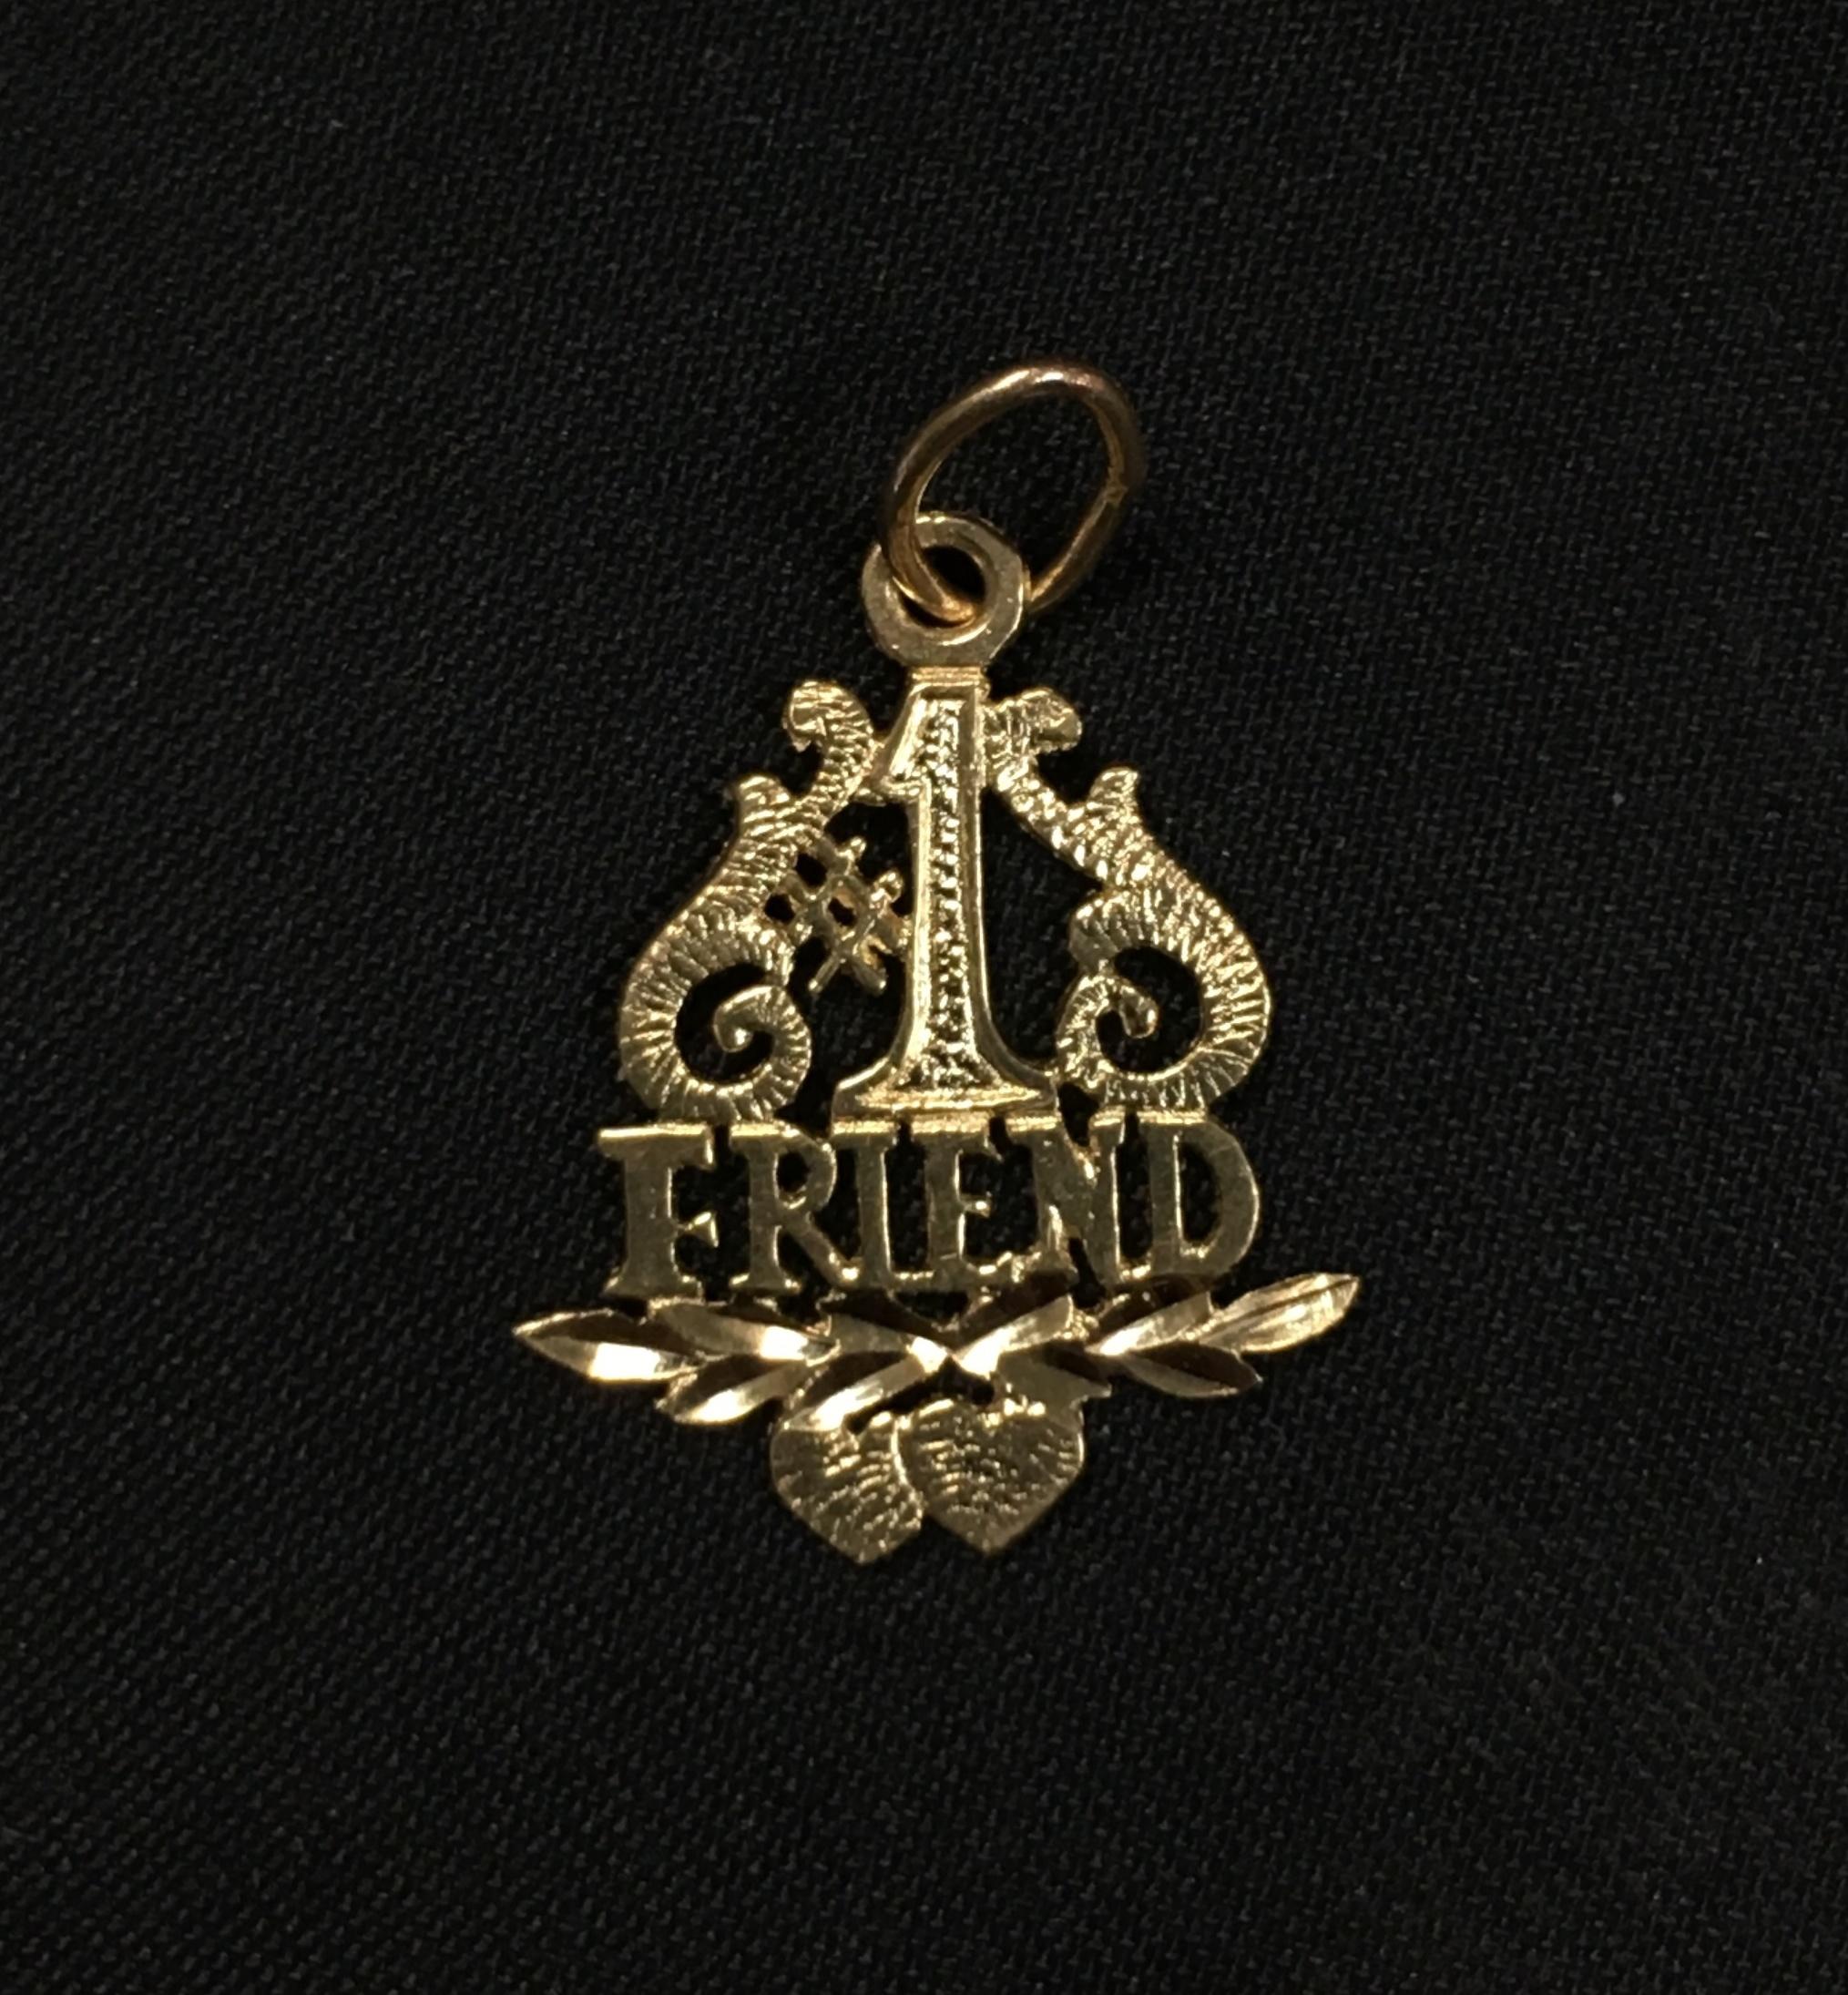 14KT YELLOW GOLD #1 FRIEND CHARM